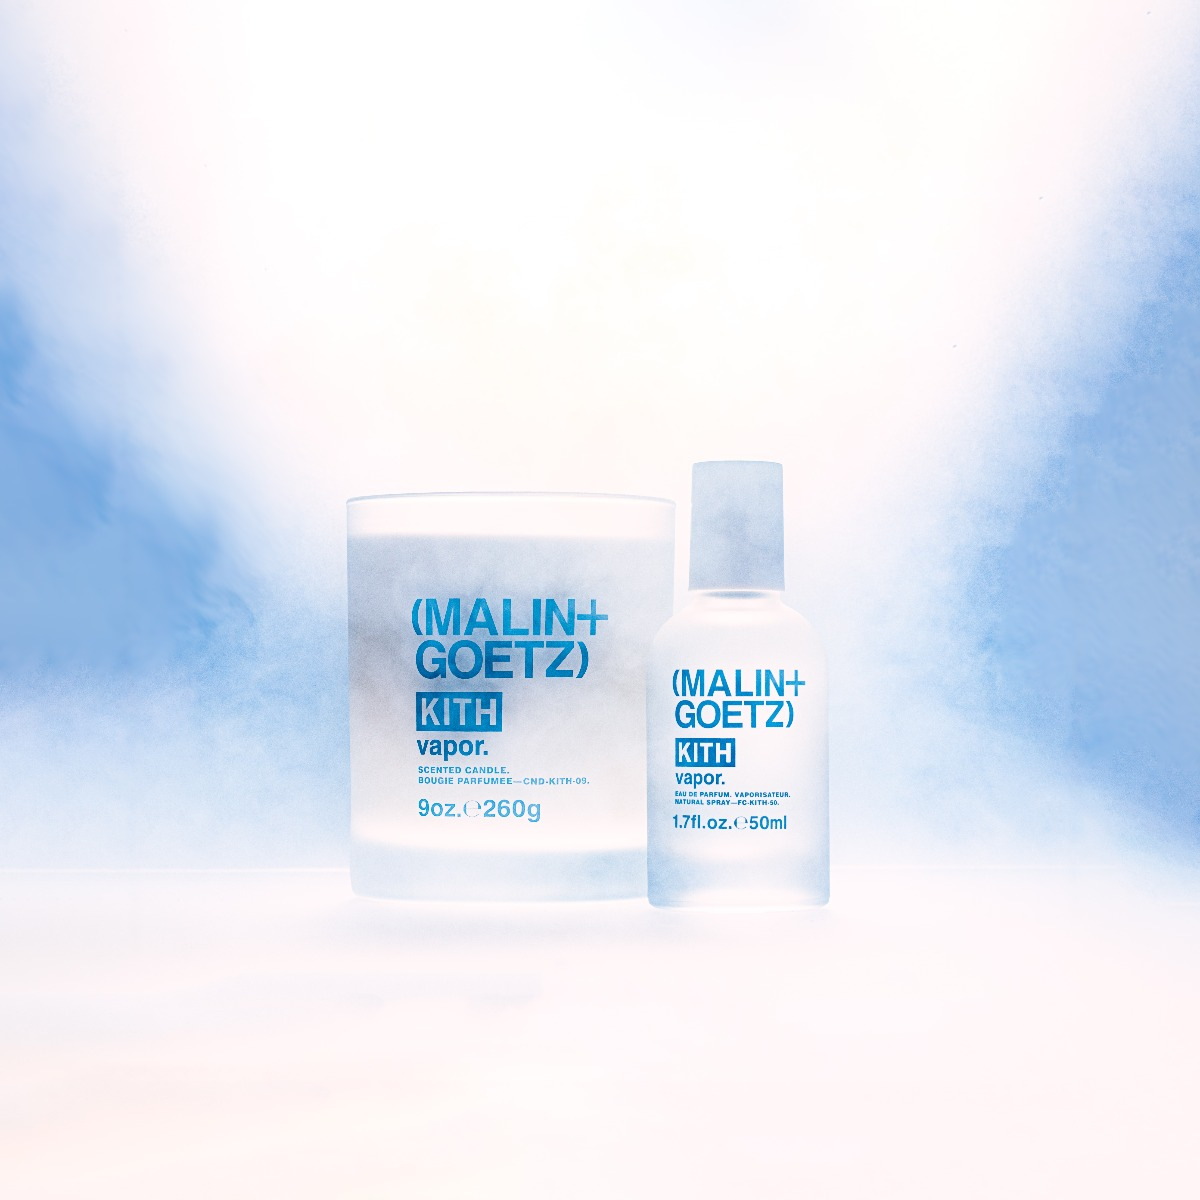 MALIN+GOETZ Kith candle and fragrance